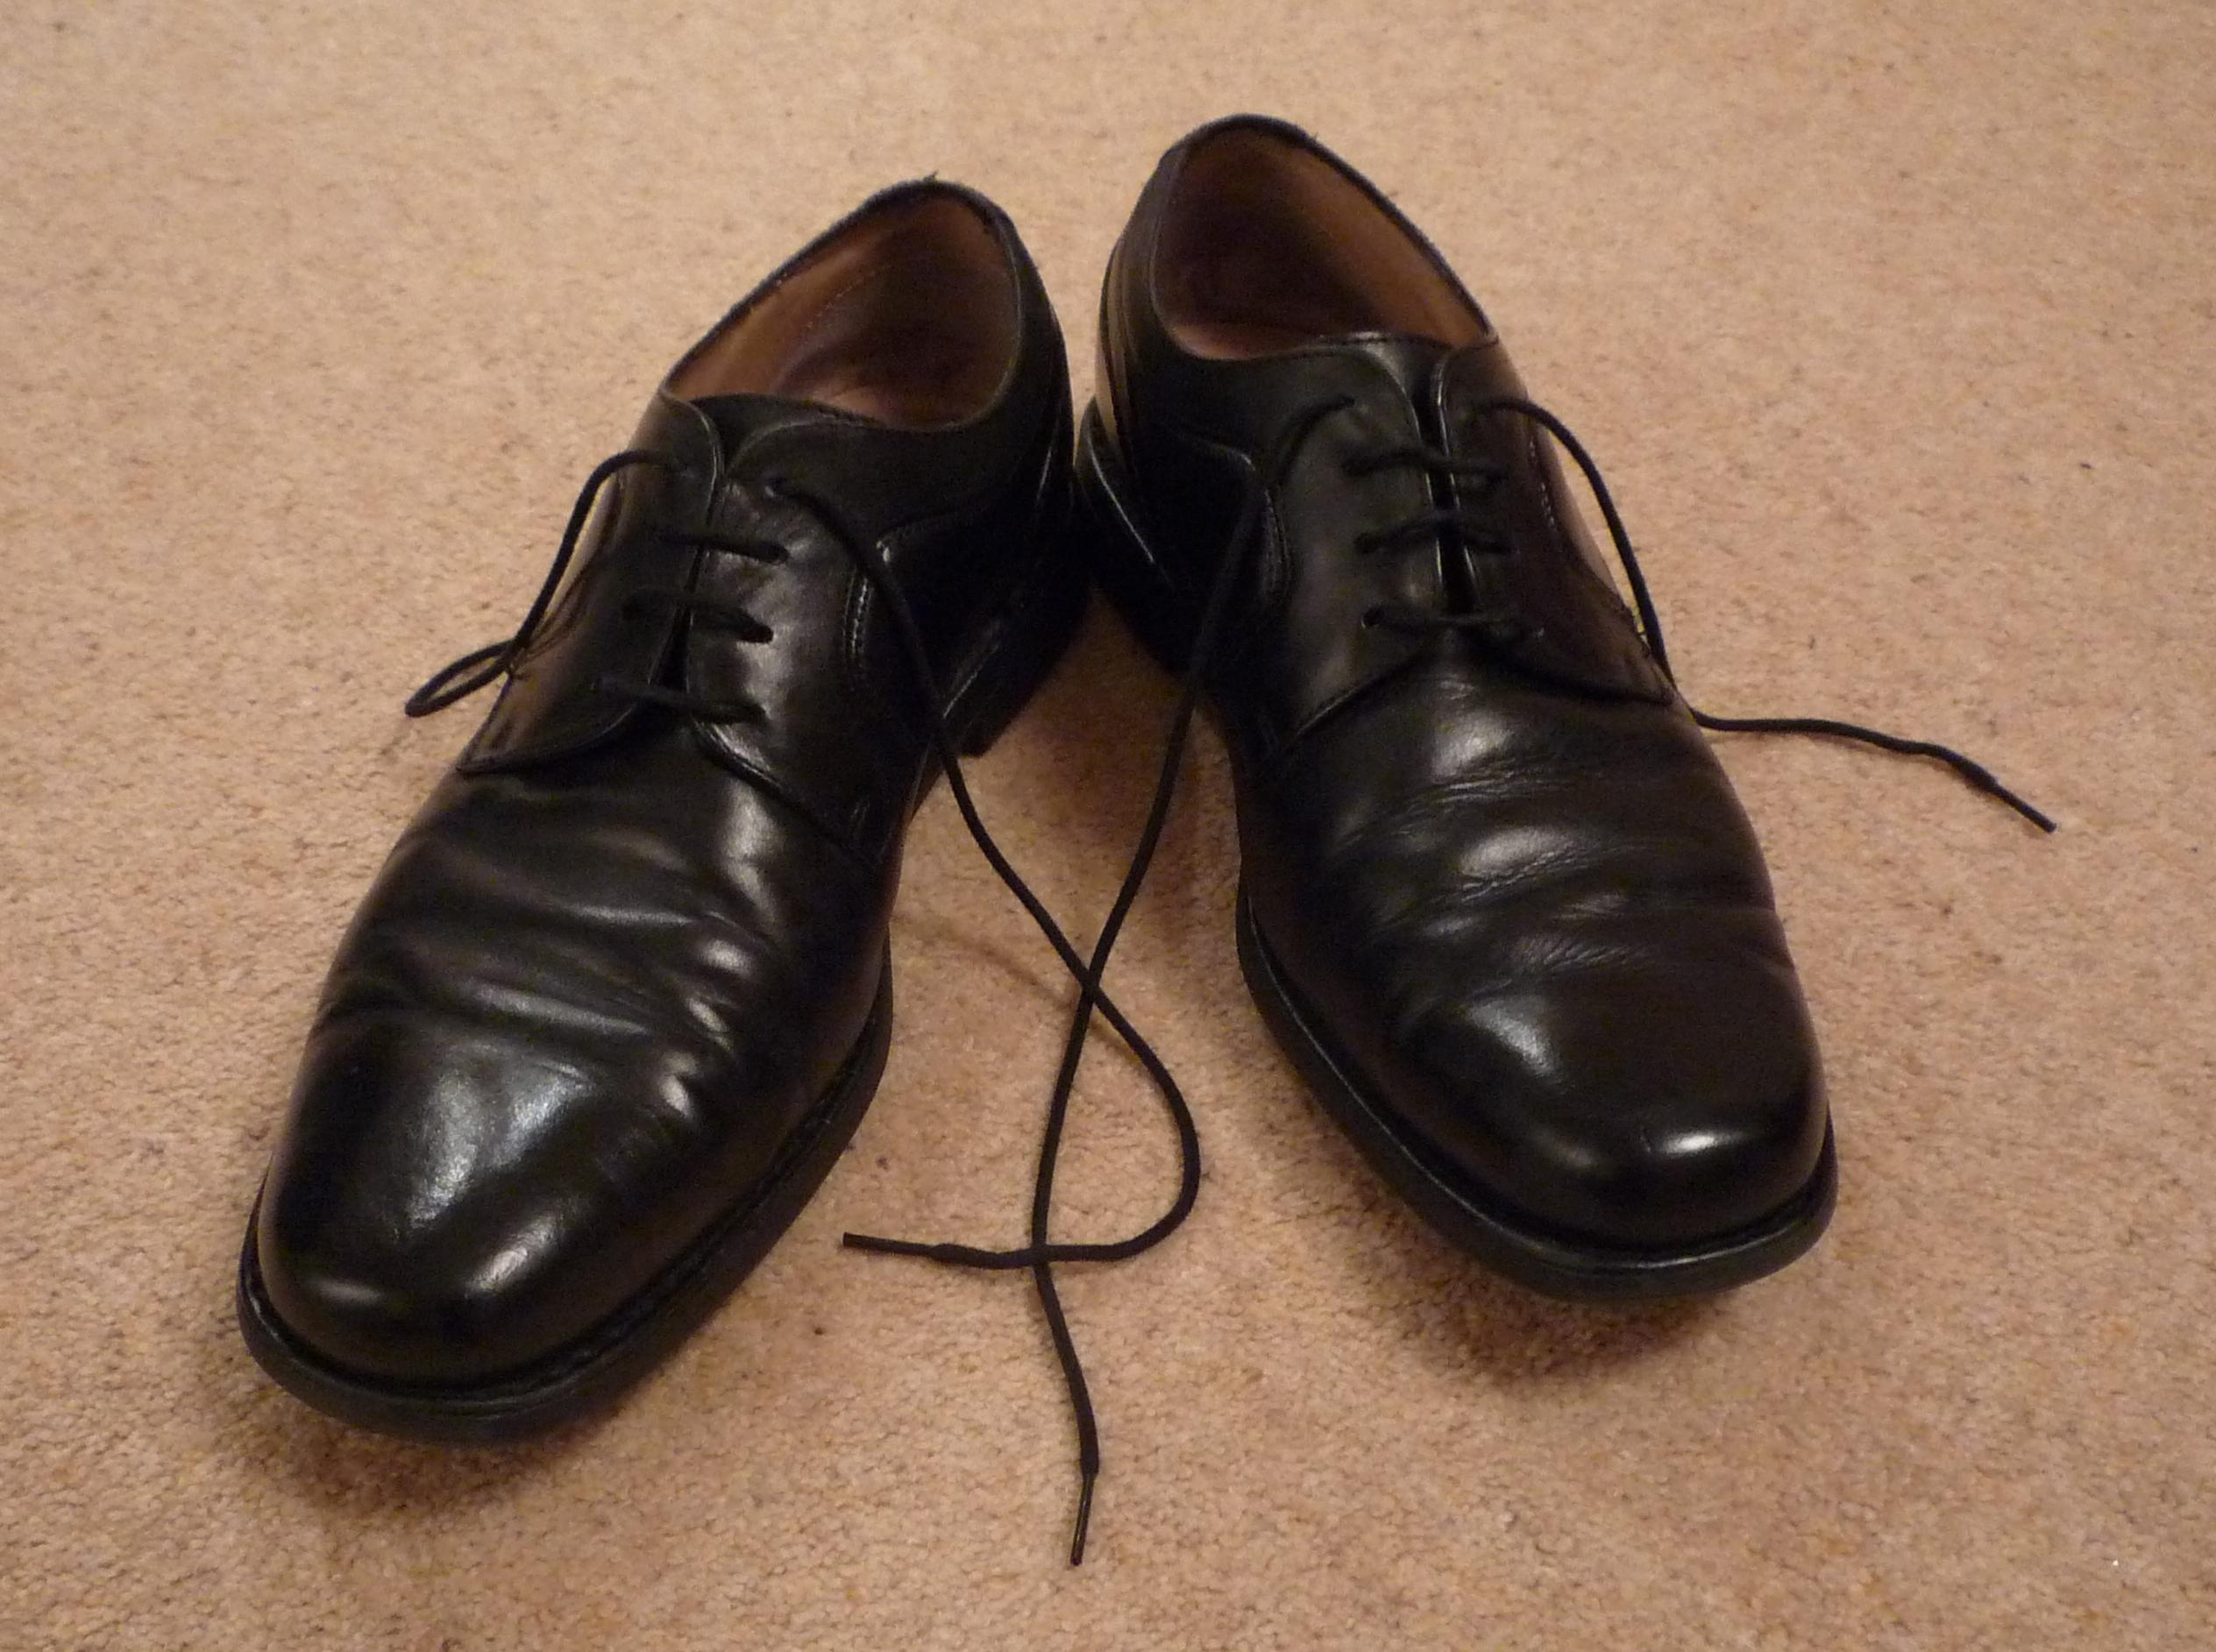 Oz's comfy shoes